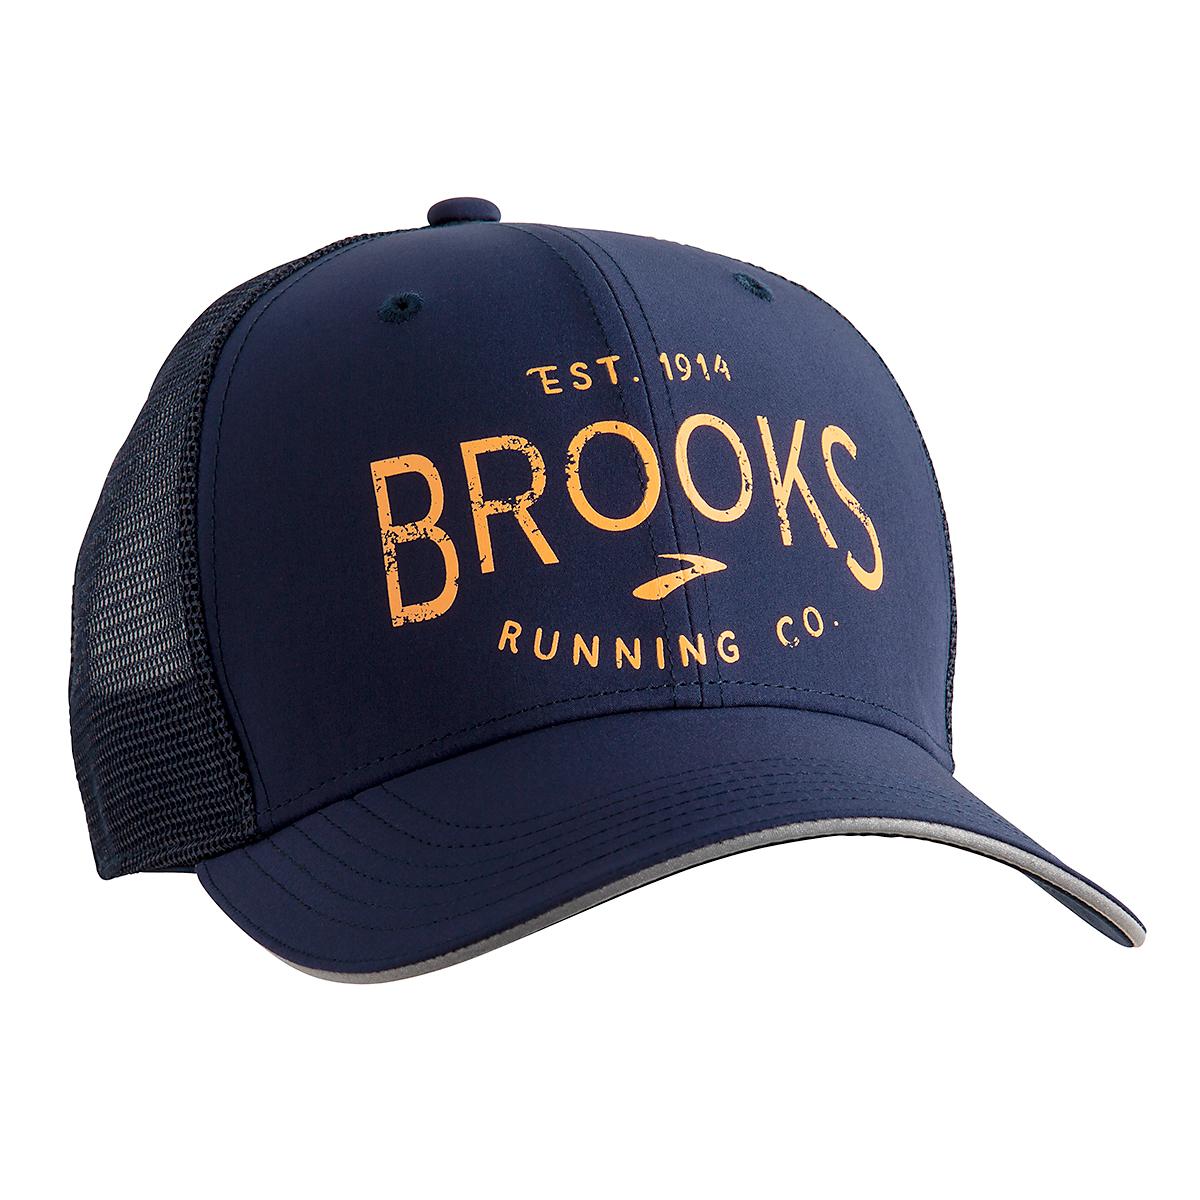 Brooks Discovery Trucker Hat - Color: Navy/Brooks Hero - Size: One Size, Navy/Brooks Hero, large, image 2